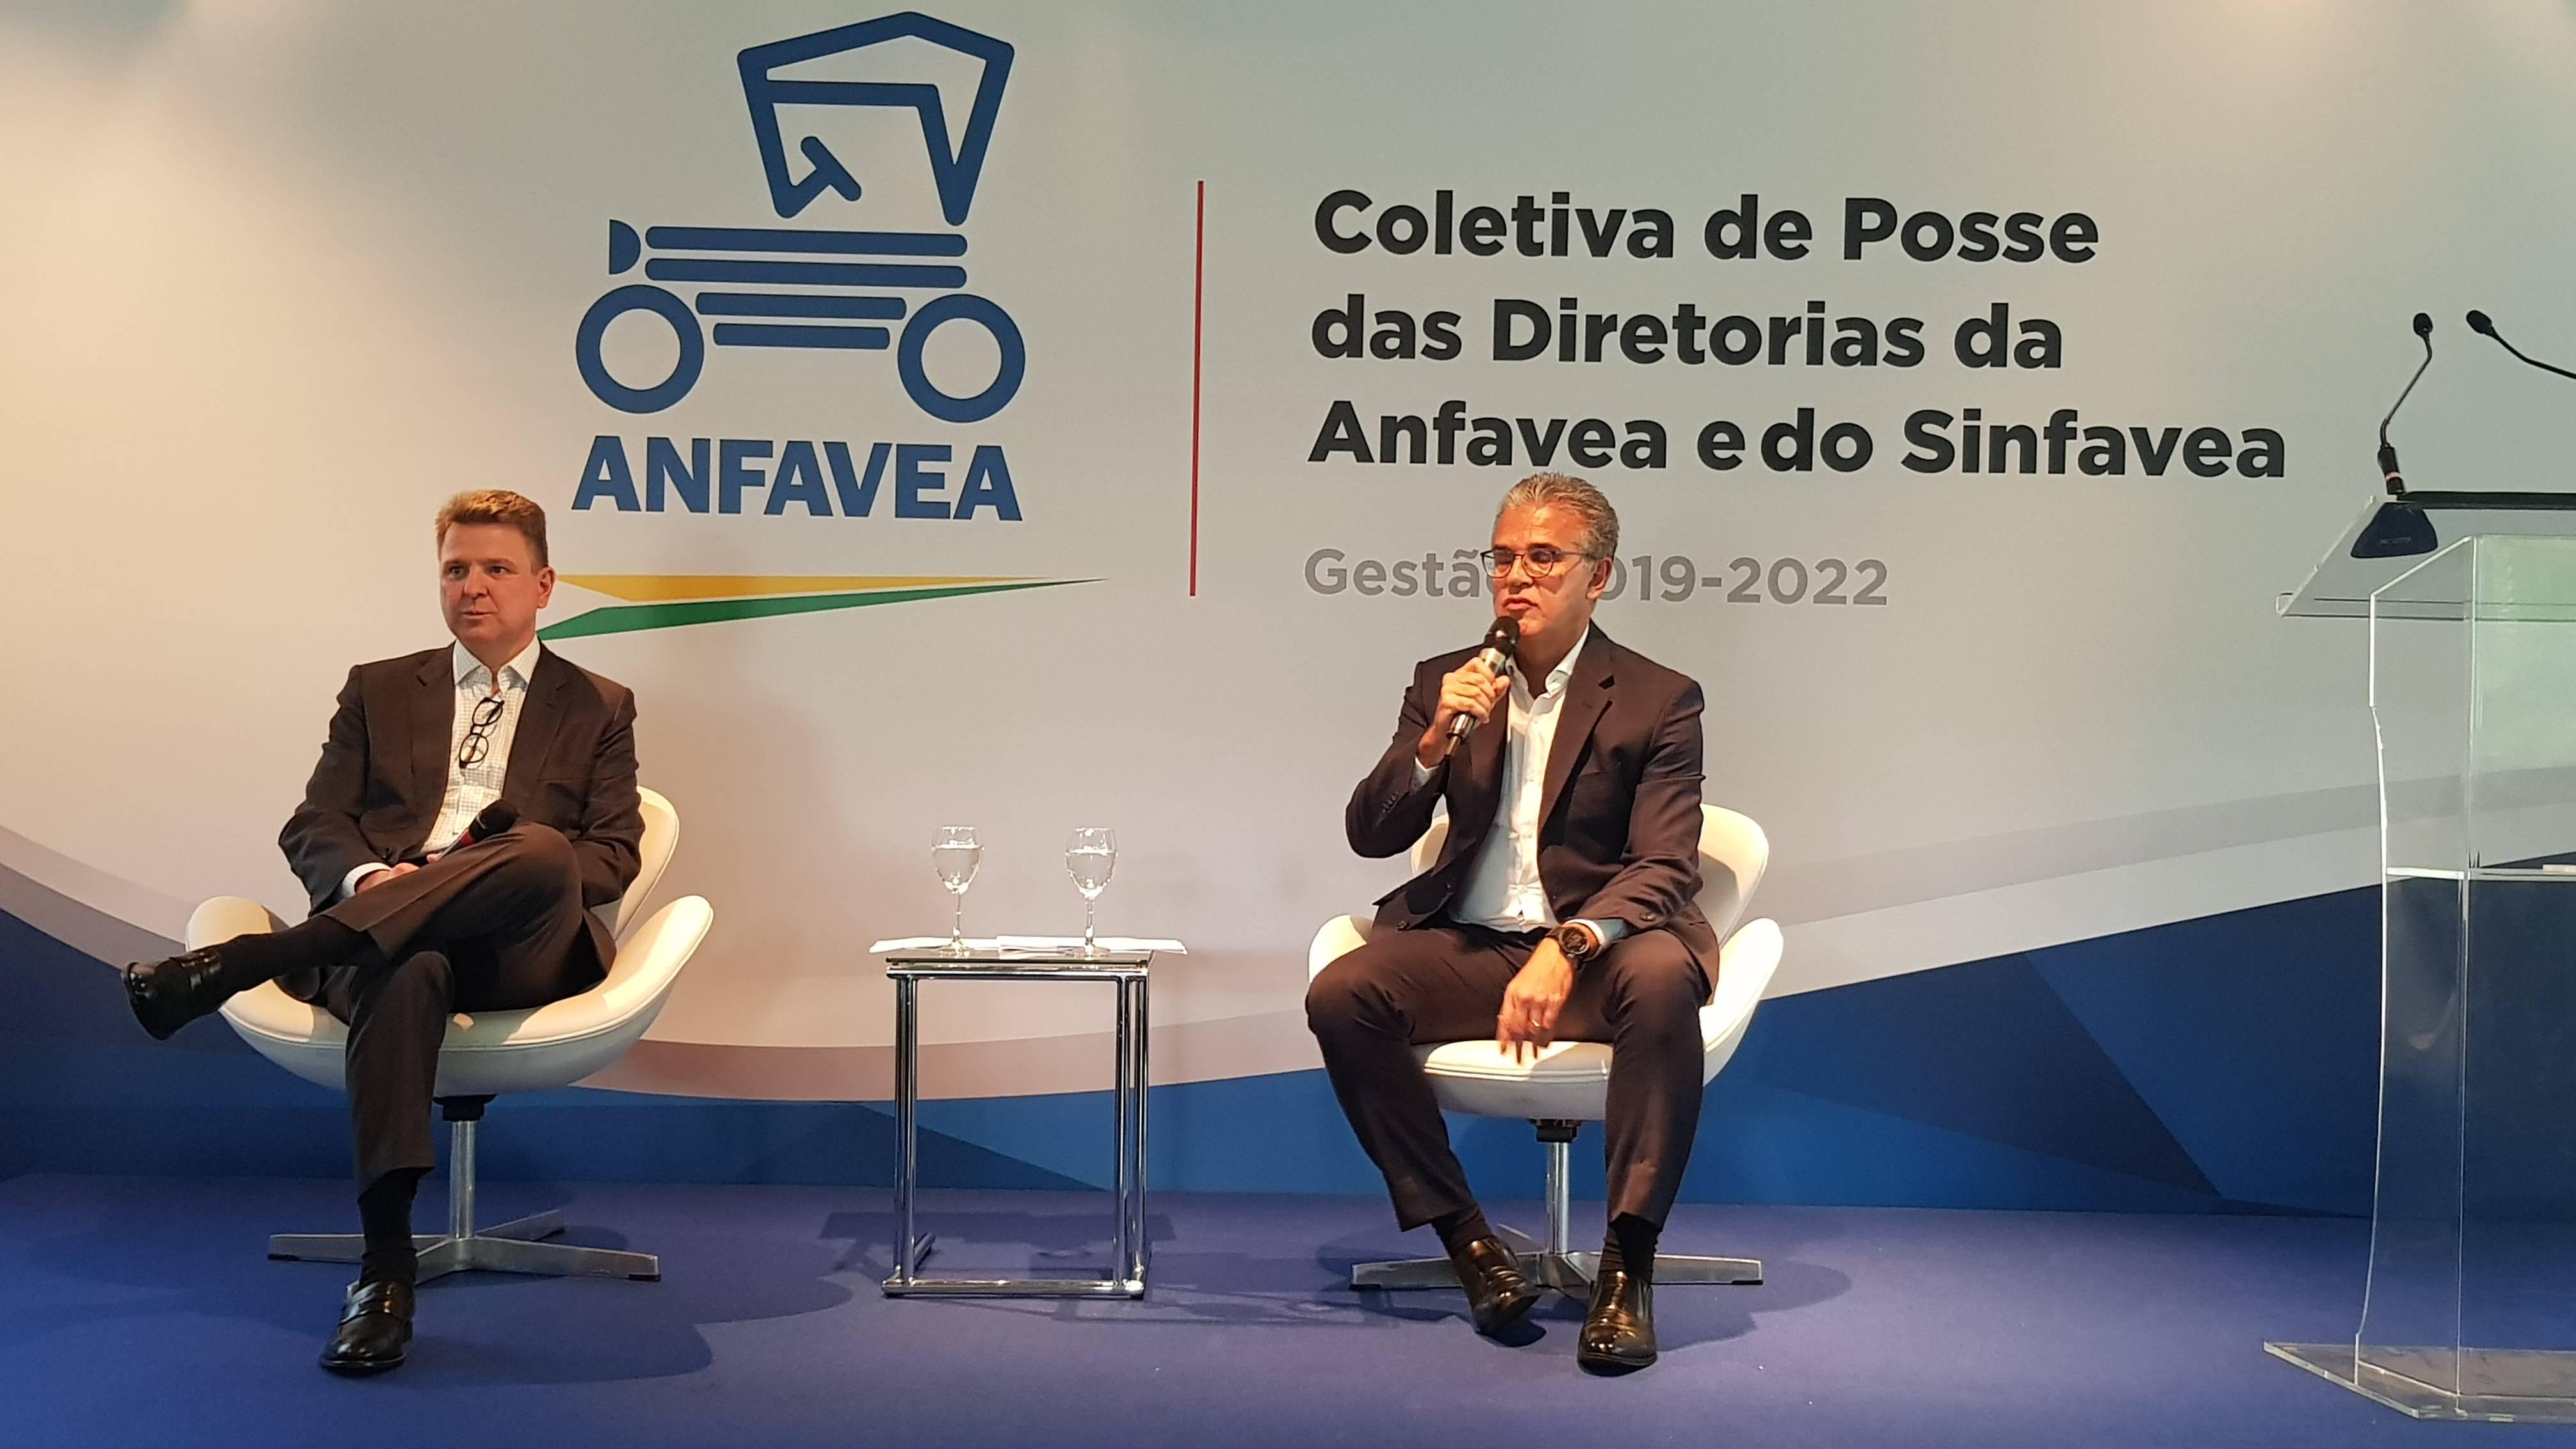 Nova gestão da Anfavea: Fabrício Biondo, vice-presidente (esq.) e Luis Carlos Moraes, presidente. Foto: Renyere Trovão/ Gazeta do Povo